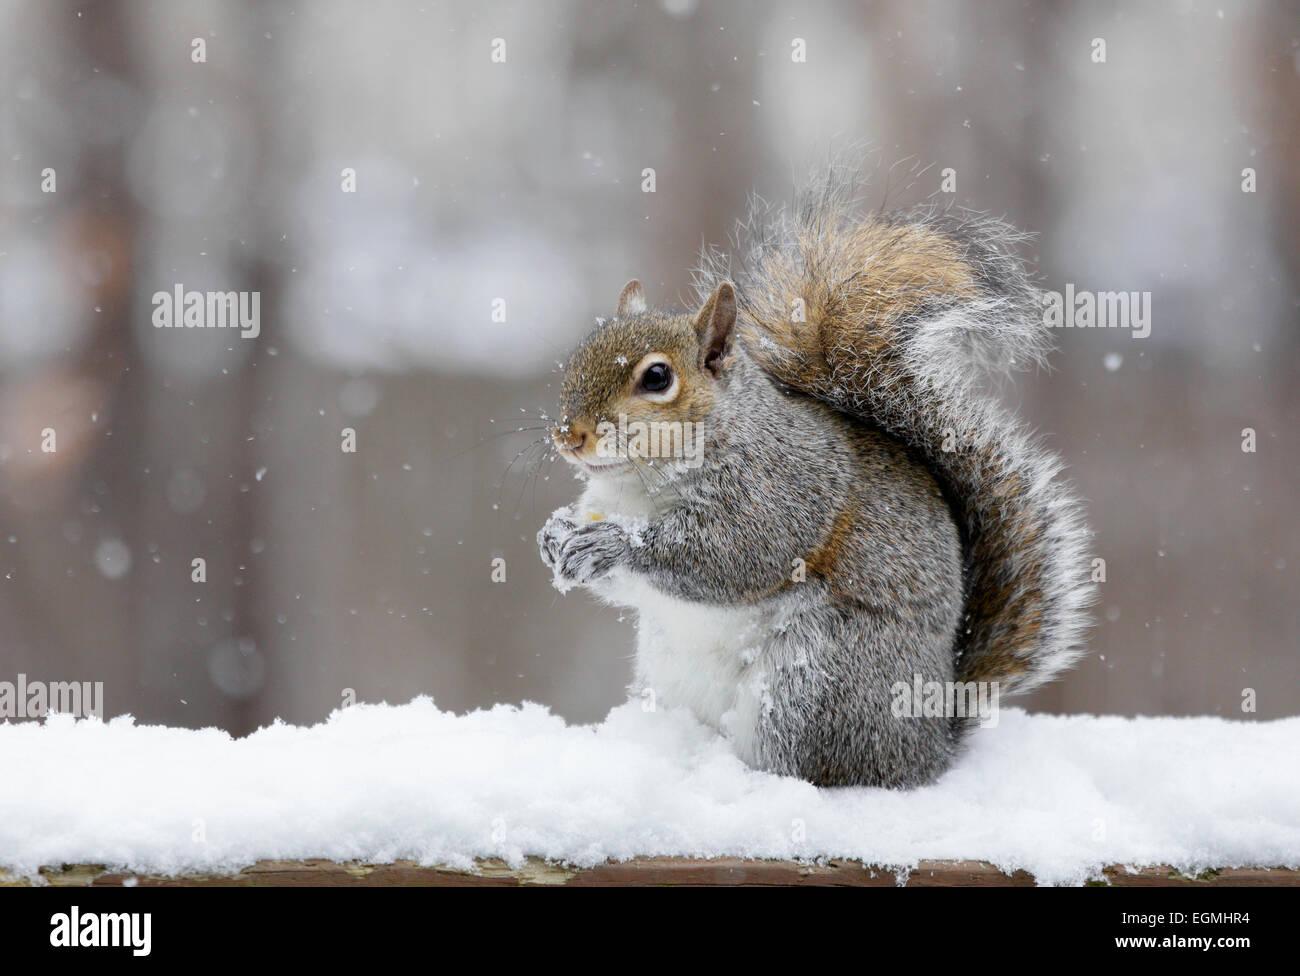 eastern-grey-sqiurrel-sciurus-carolinensis-in-the-snow-EGMHR4.jpg